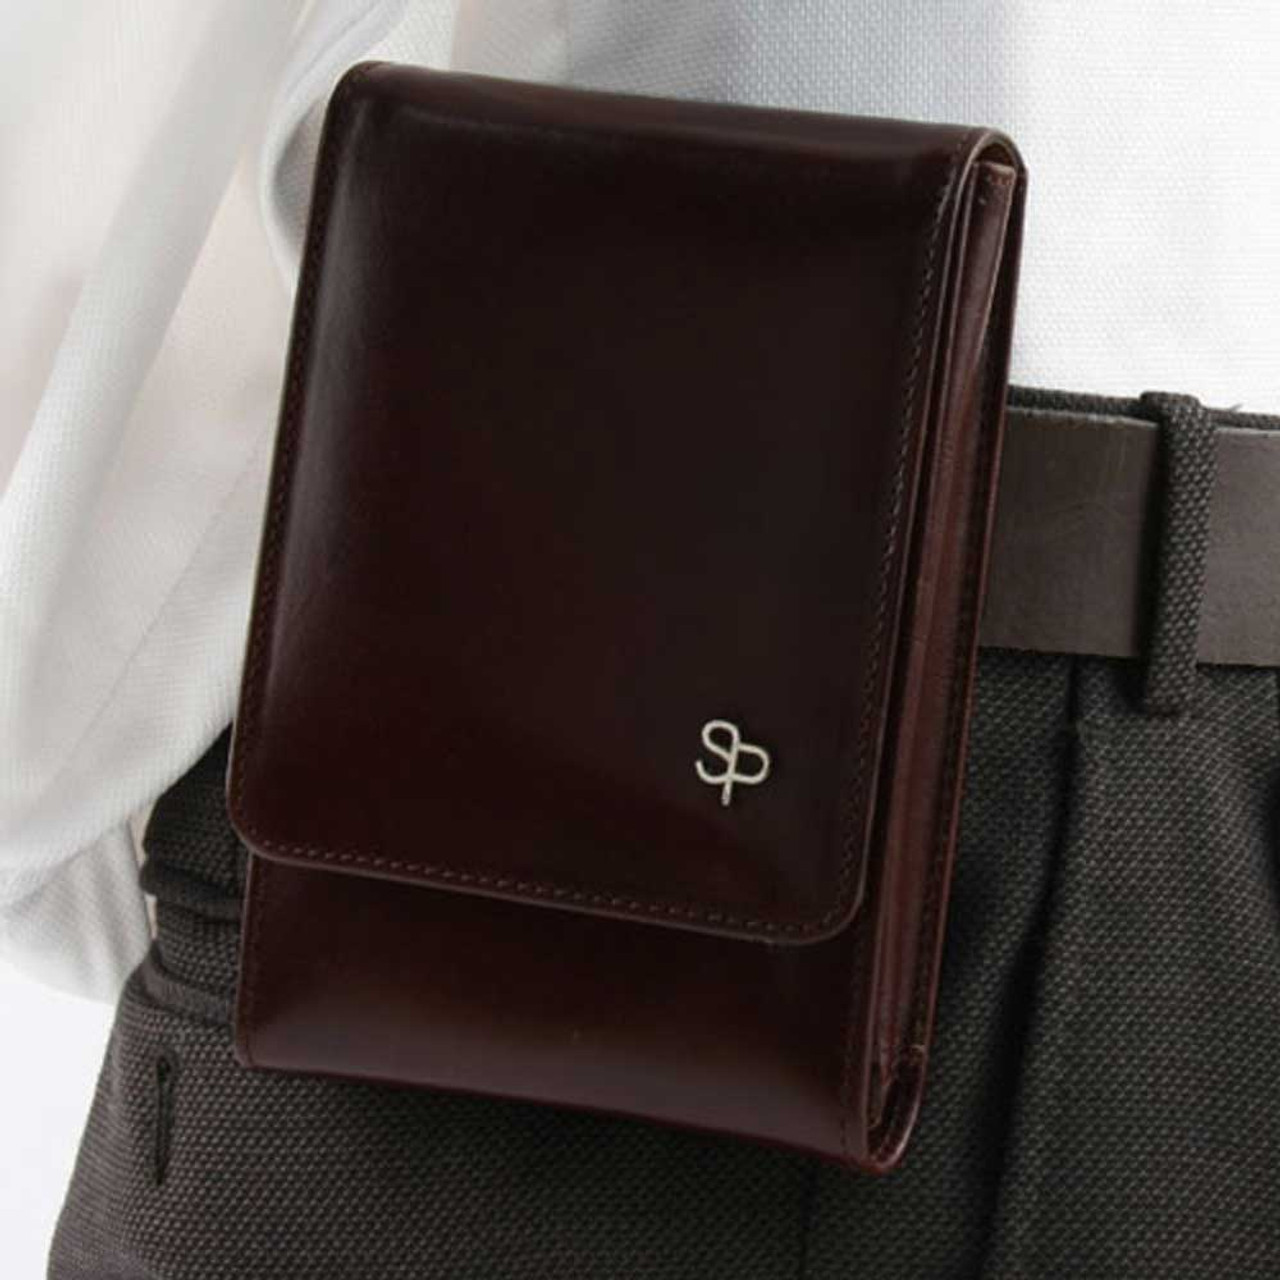 M&P 45 Shield Concealed Carry Holster (Belt Loop)